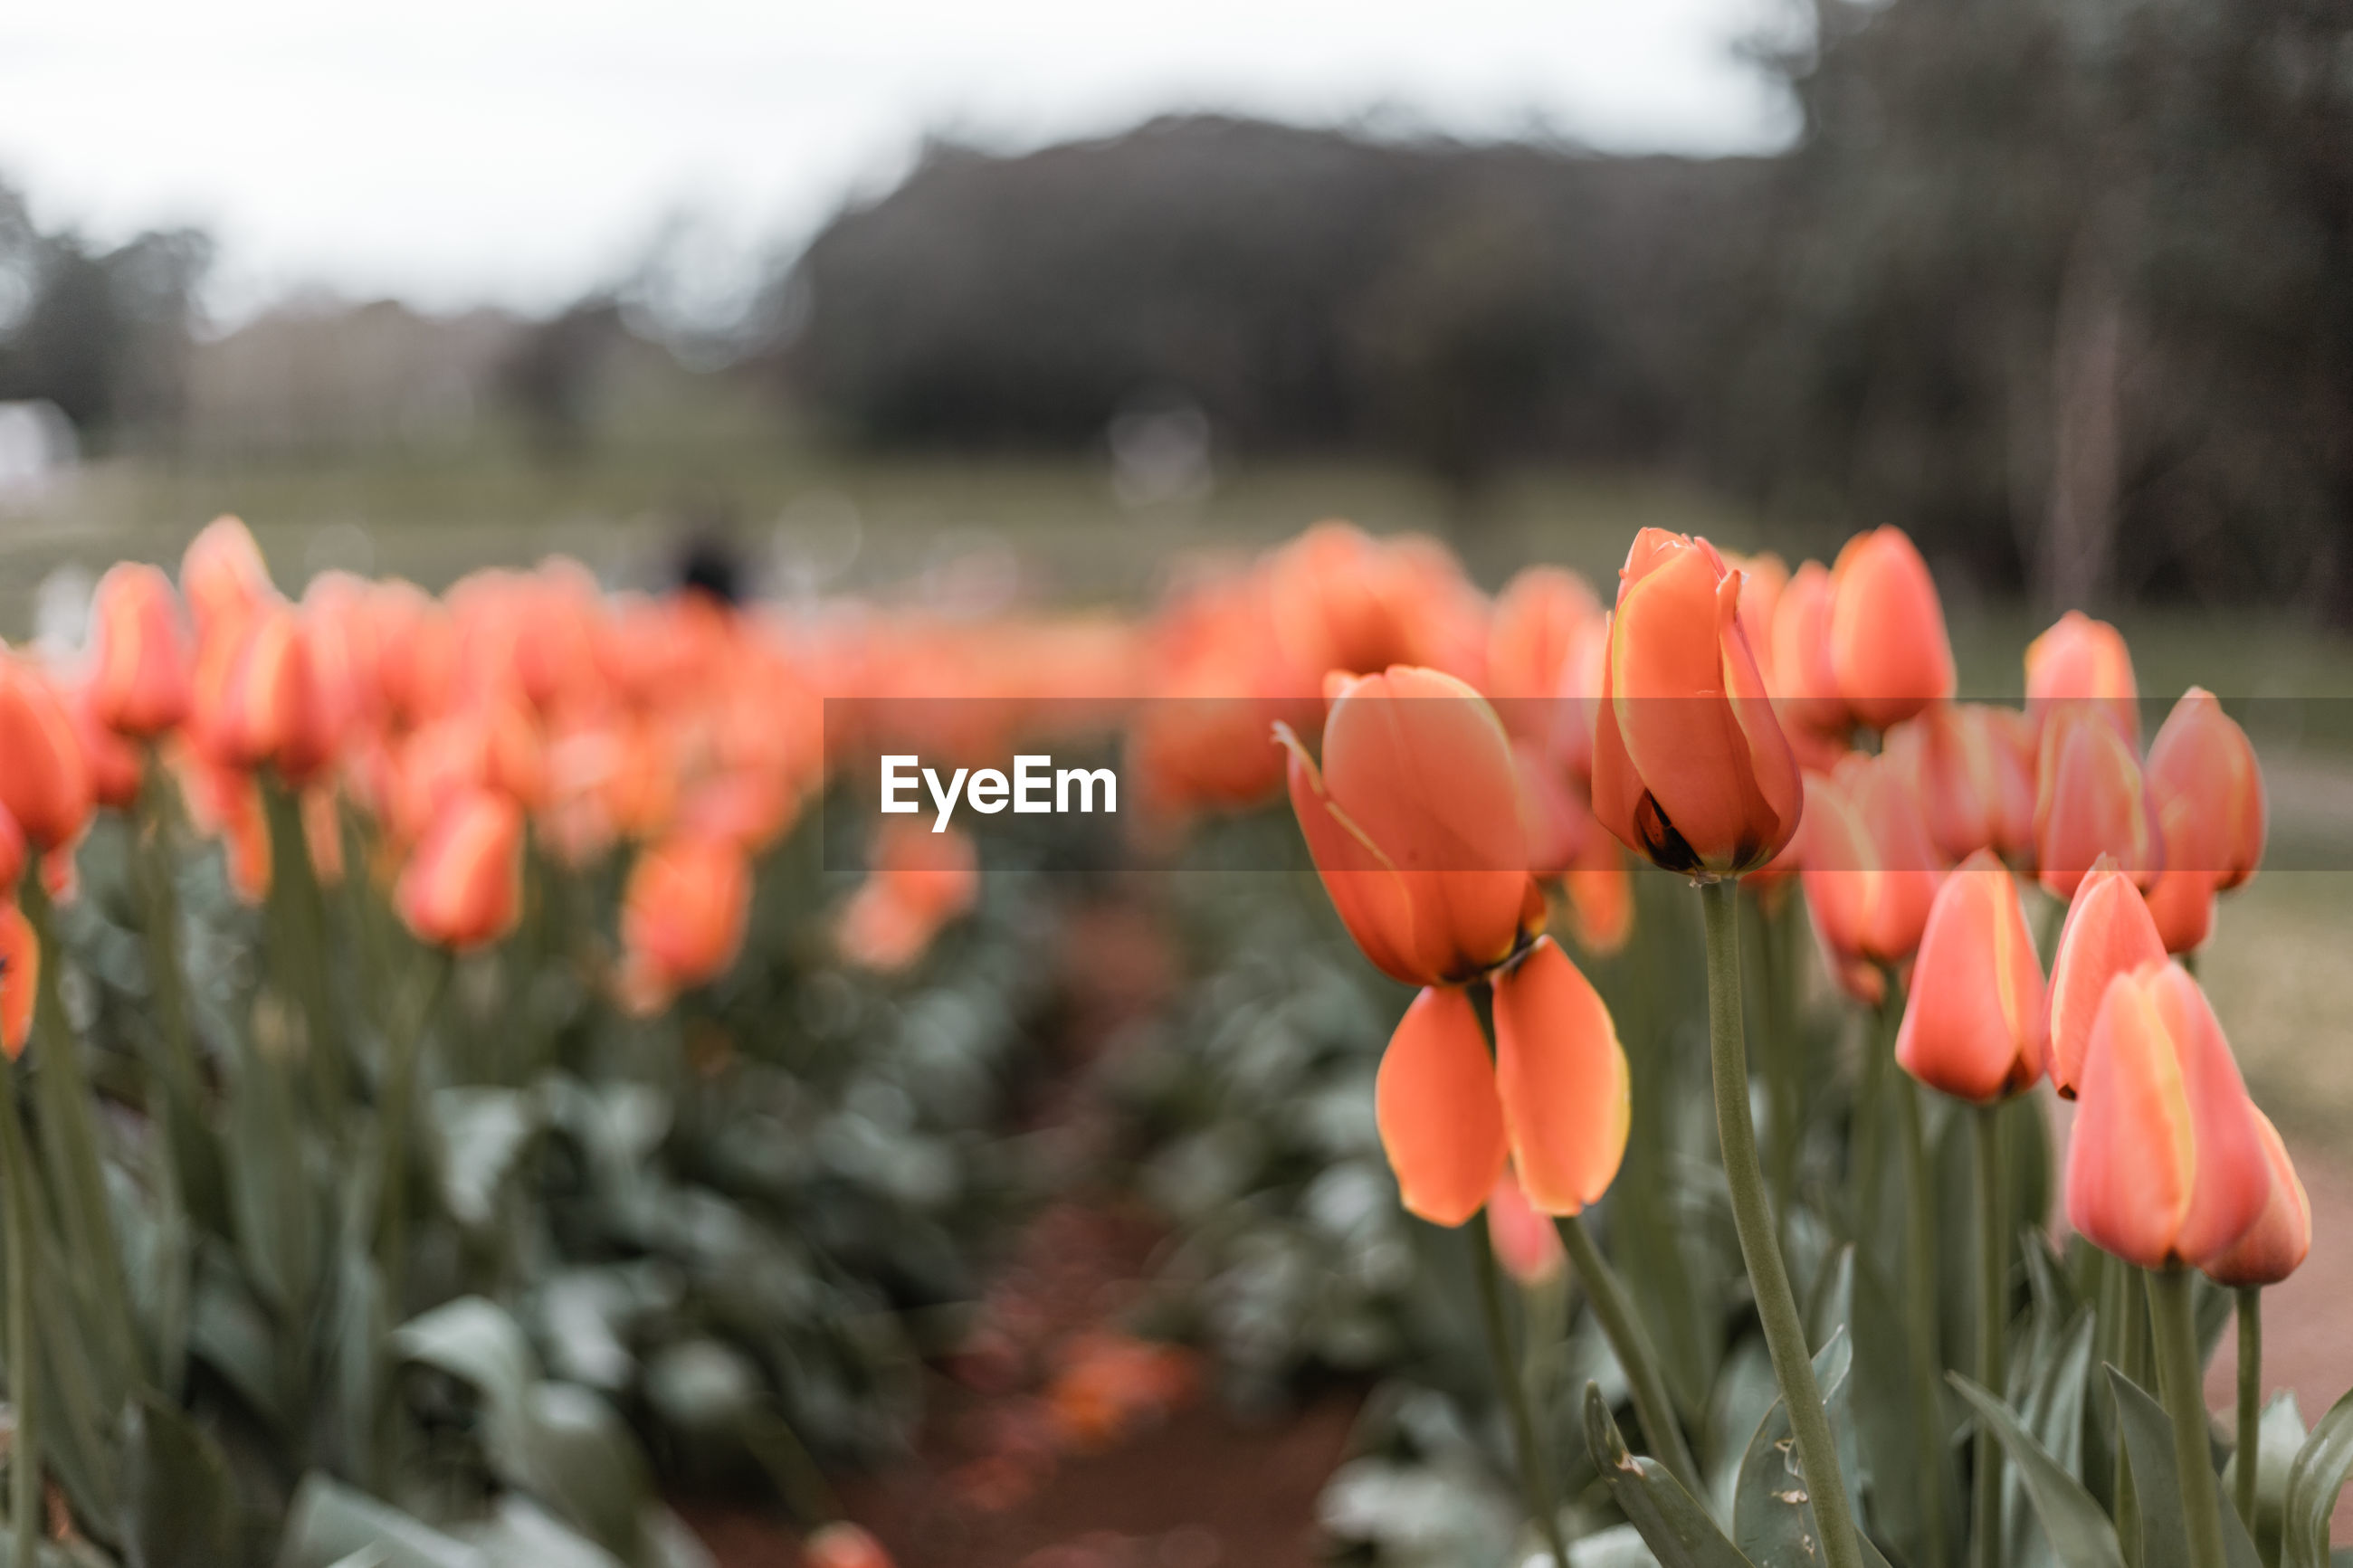 CLOSE-UP OF ORANGE FLOWERS ON FIELD